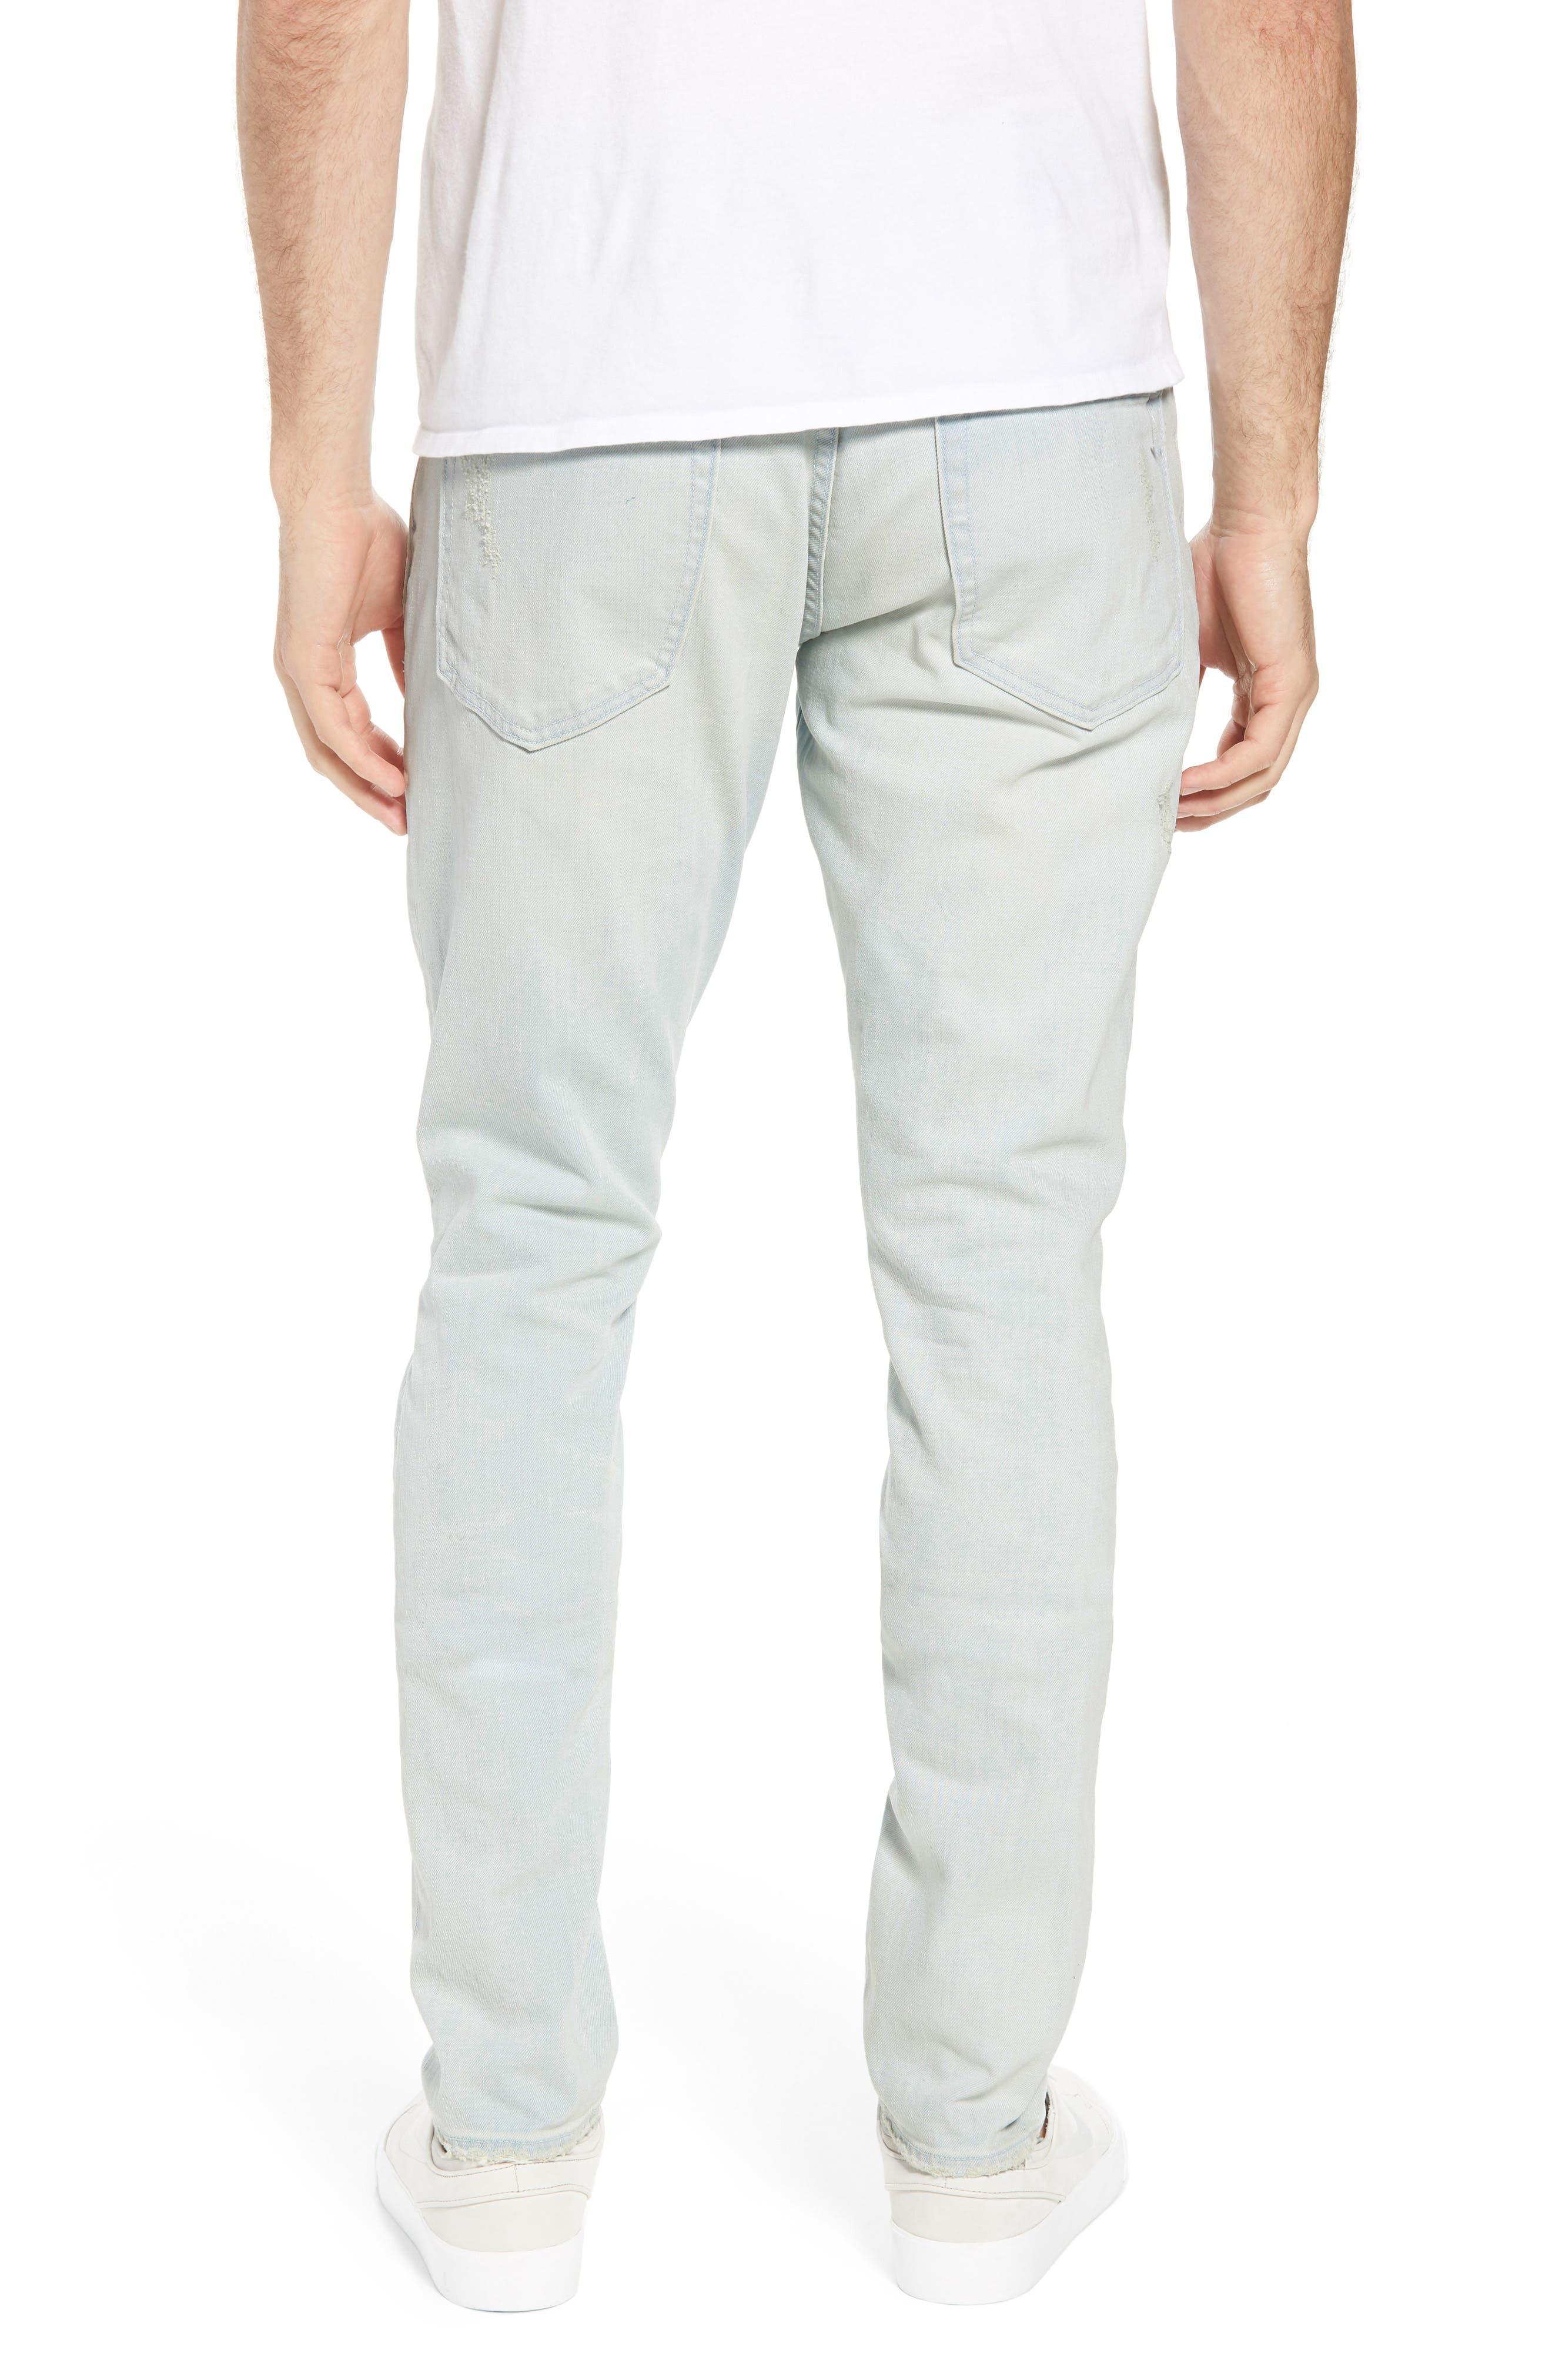 Windsor Slim Fit Jeans,                             Alternate thumbnail 2, color,                             Blue